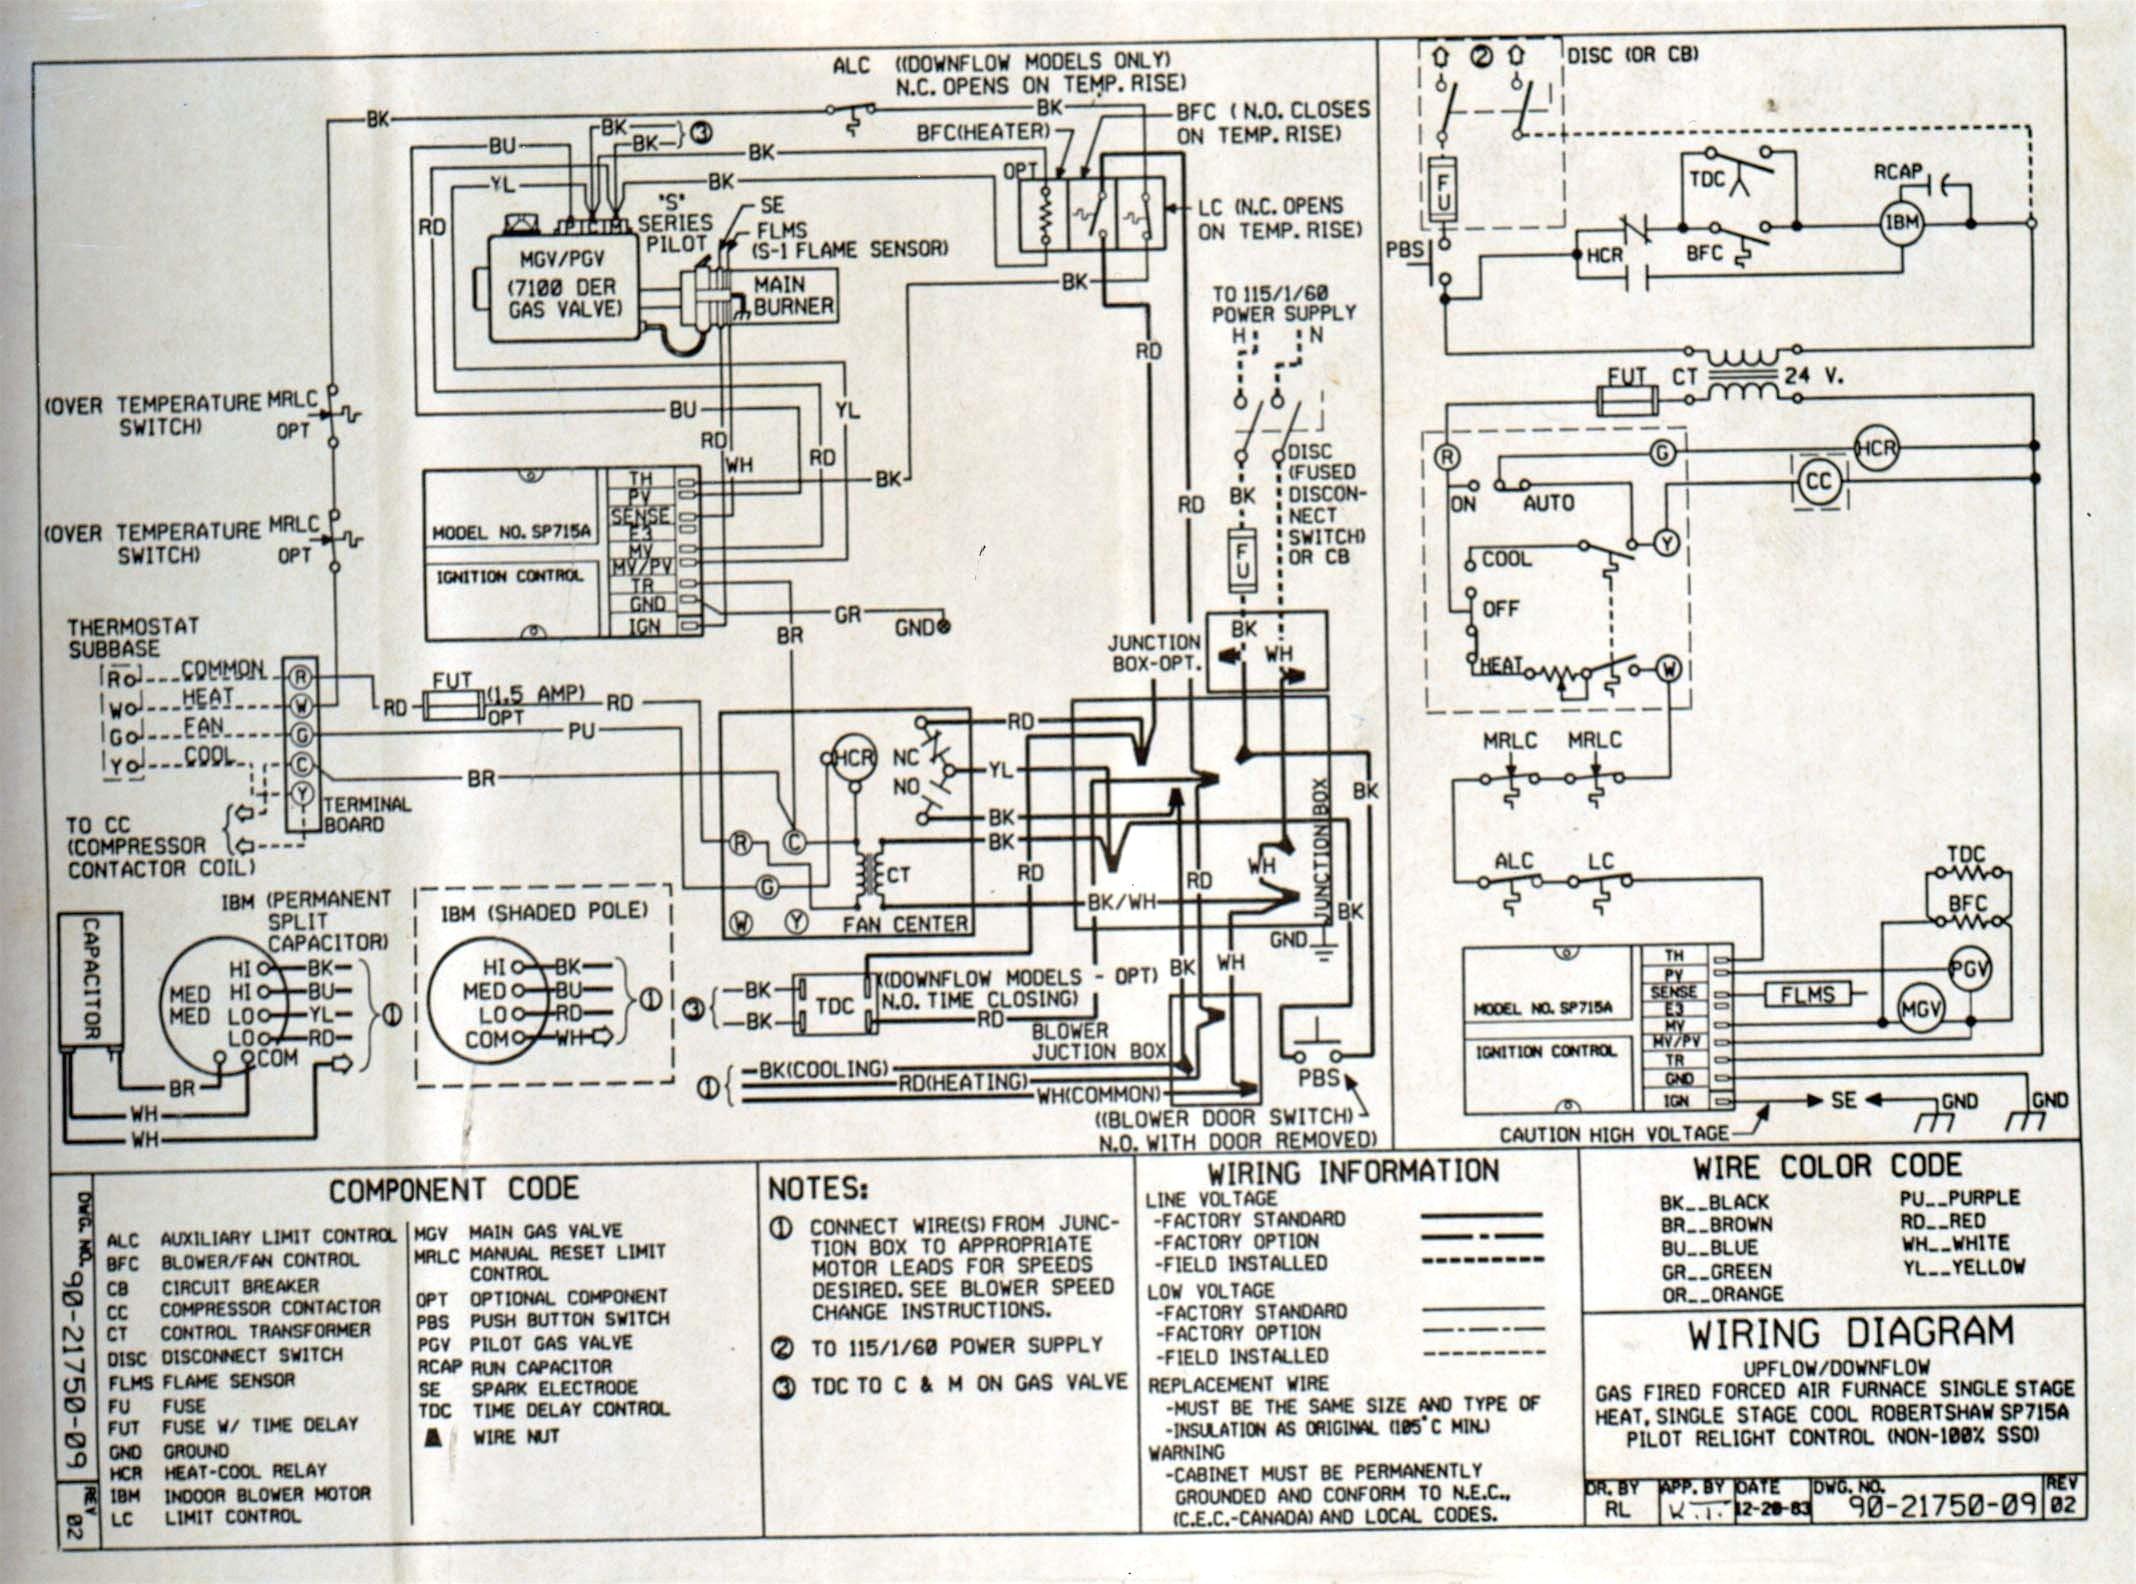 Furnace Blower Motor Wiring Diagram Wiring Diagram Hvac Blower Inspirationa Electric Furnace Fan Relay Of Furnace Blower Motor Wiring Diagram